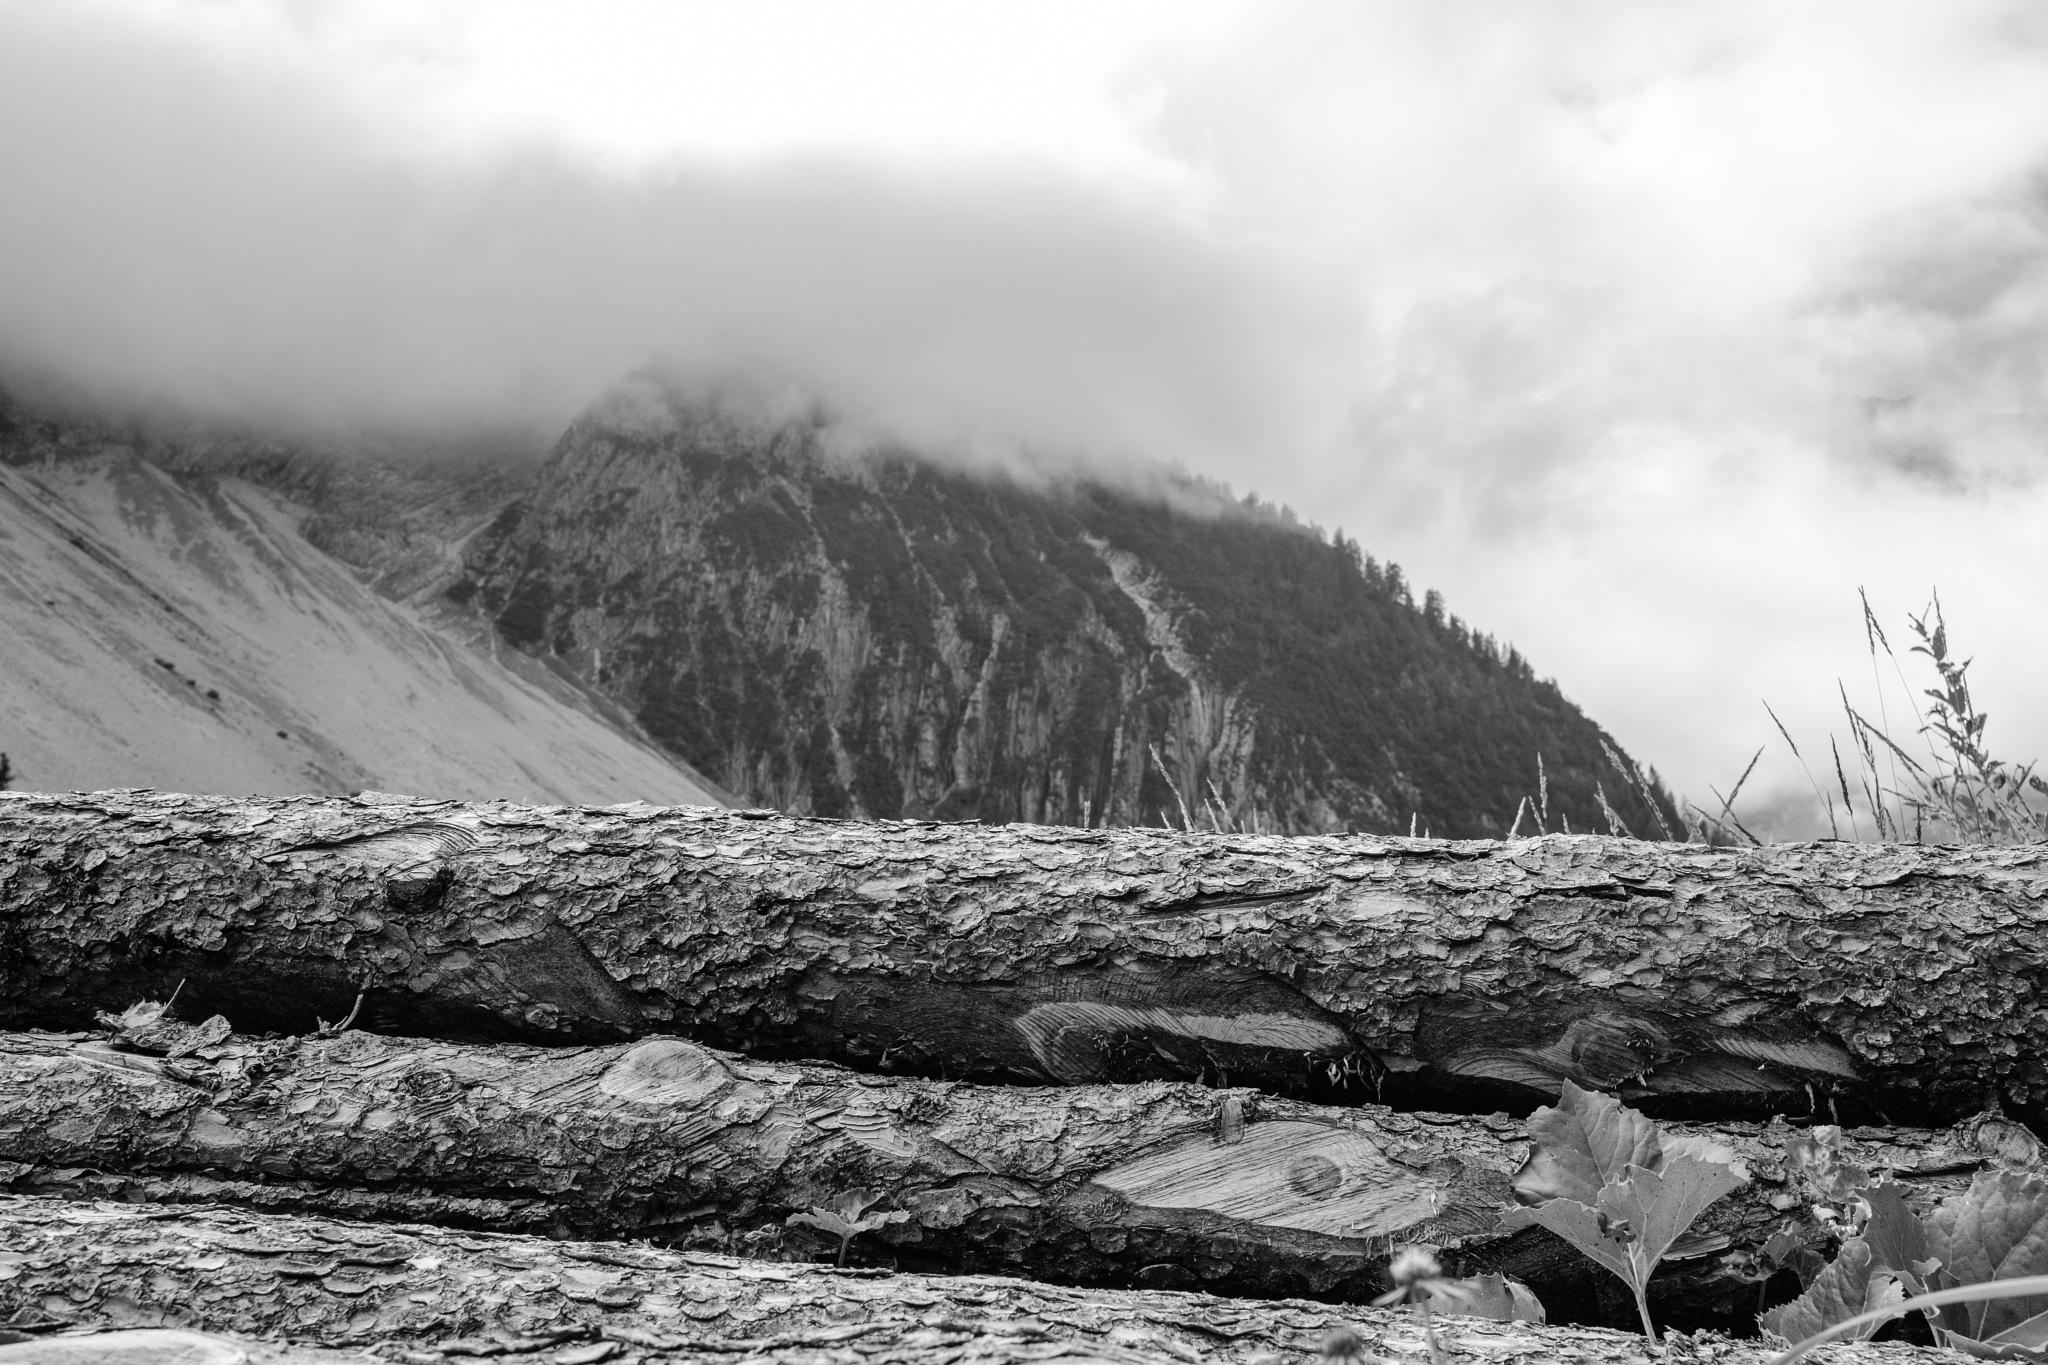 Misty mountains by Henk Spijkerman